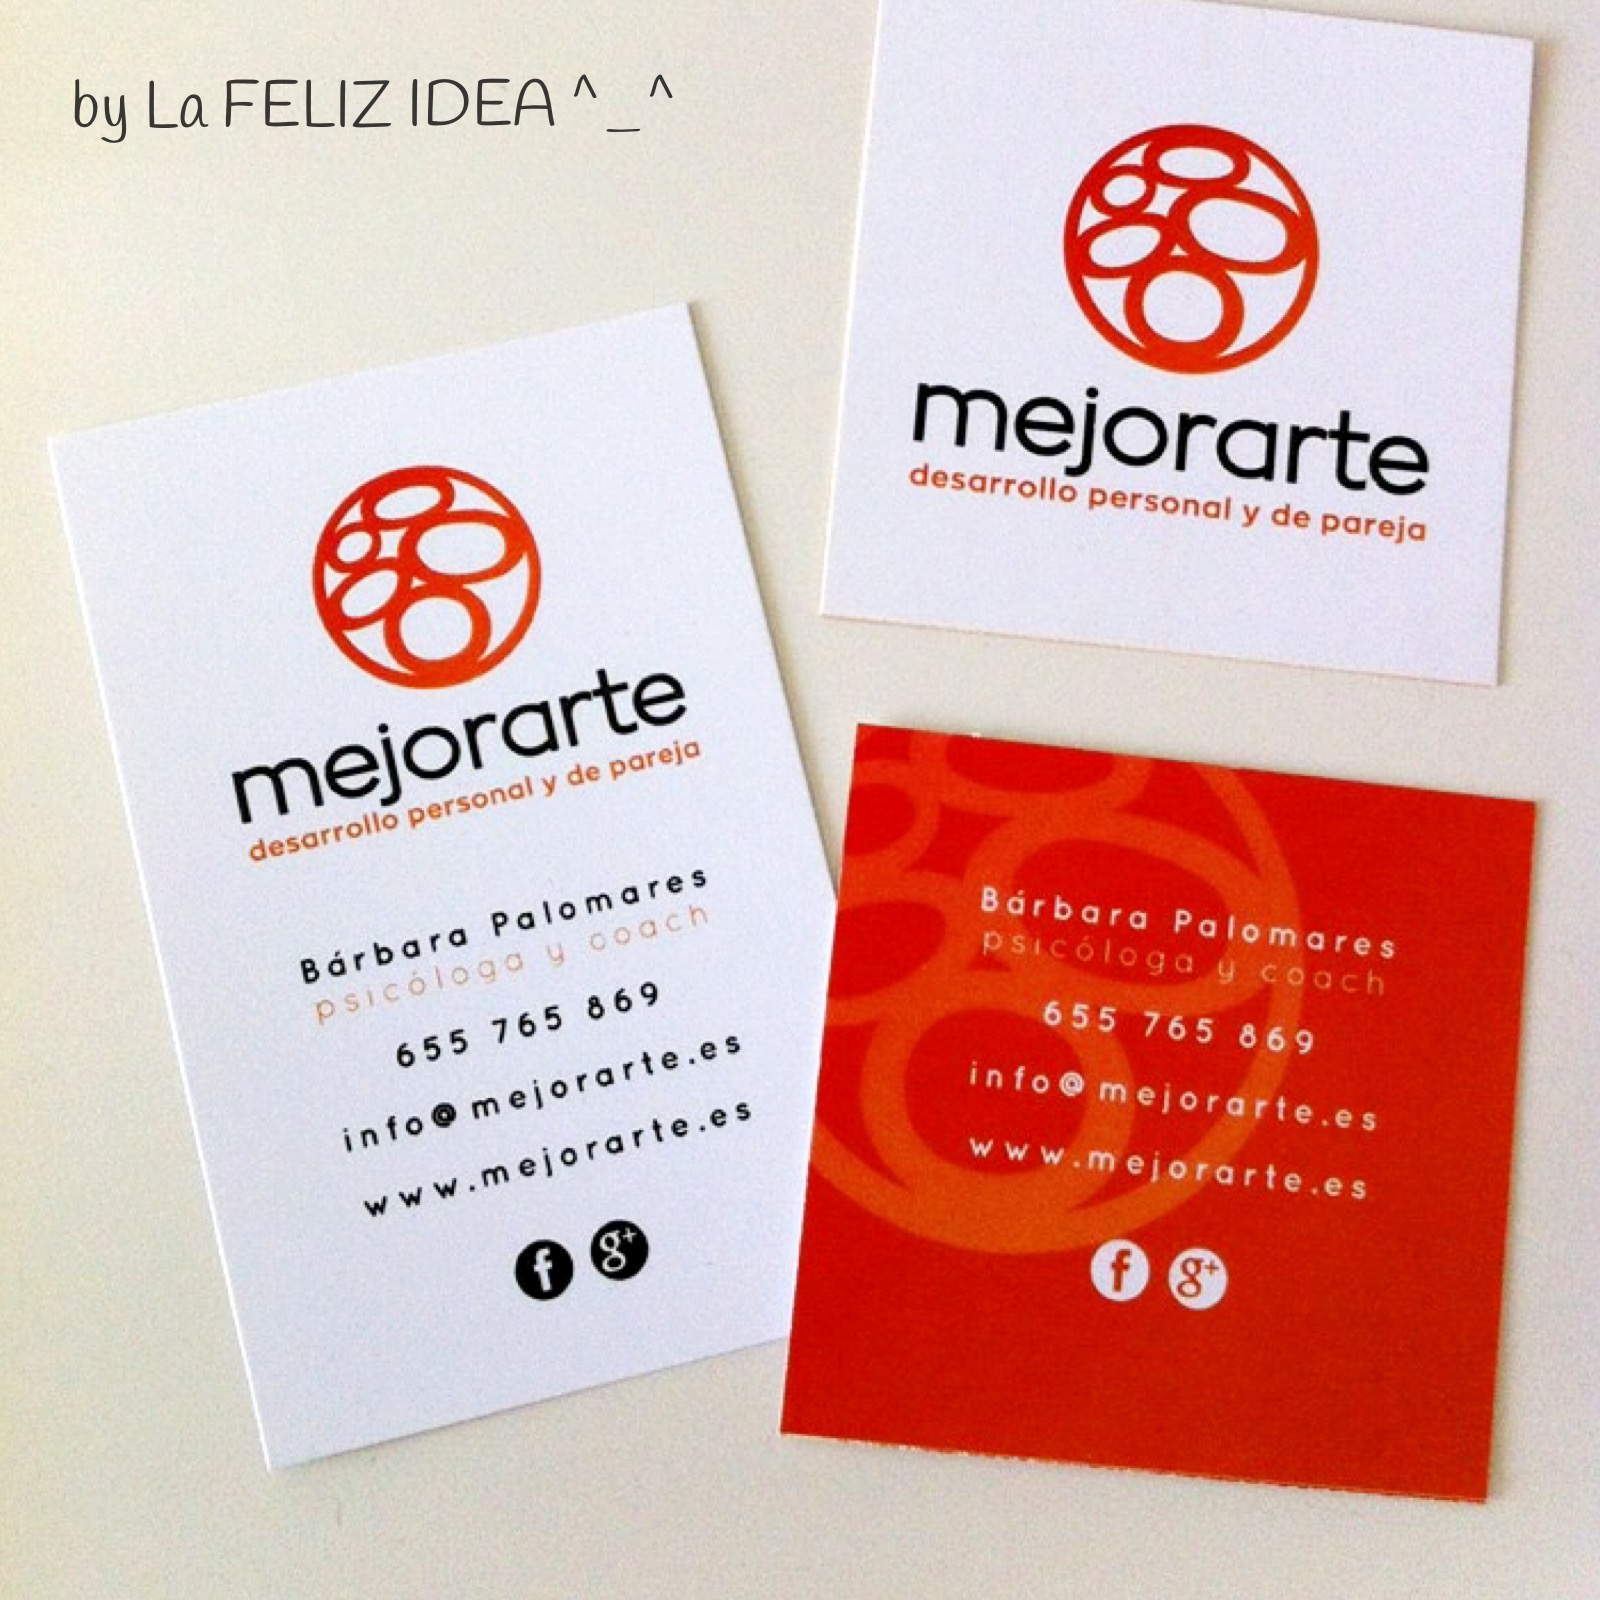 Pscologist bussines cards design / Diseño de tarjetas de visita para psicologa